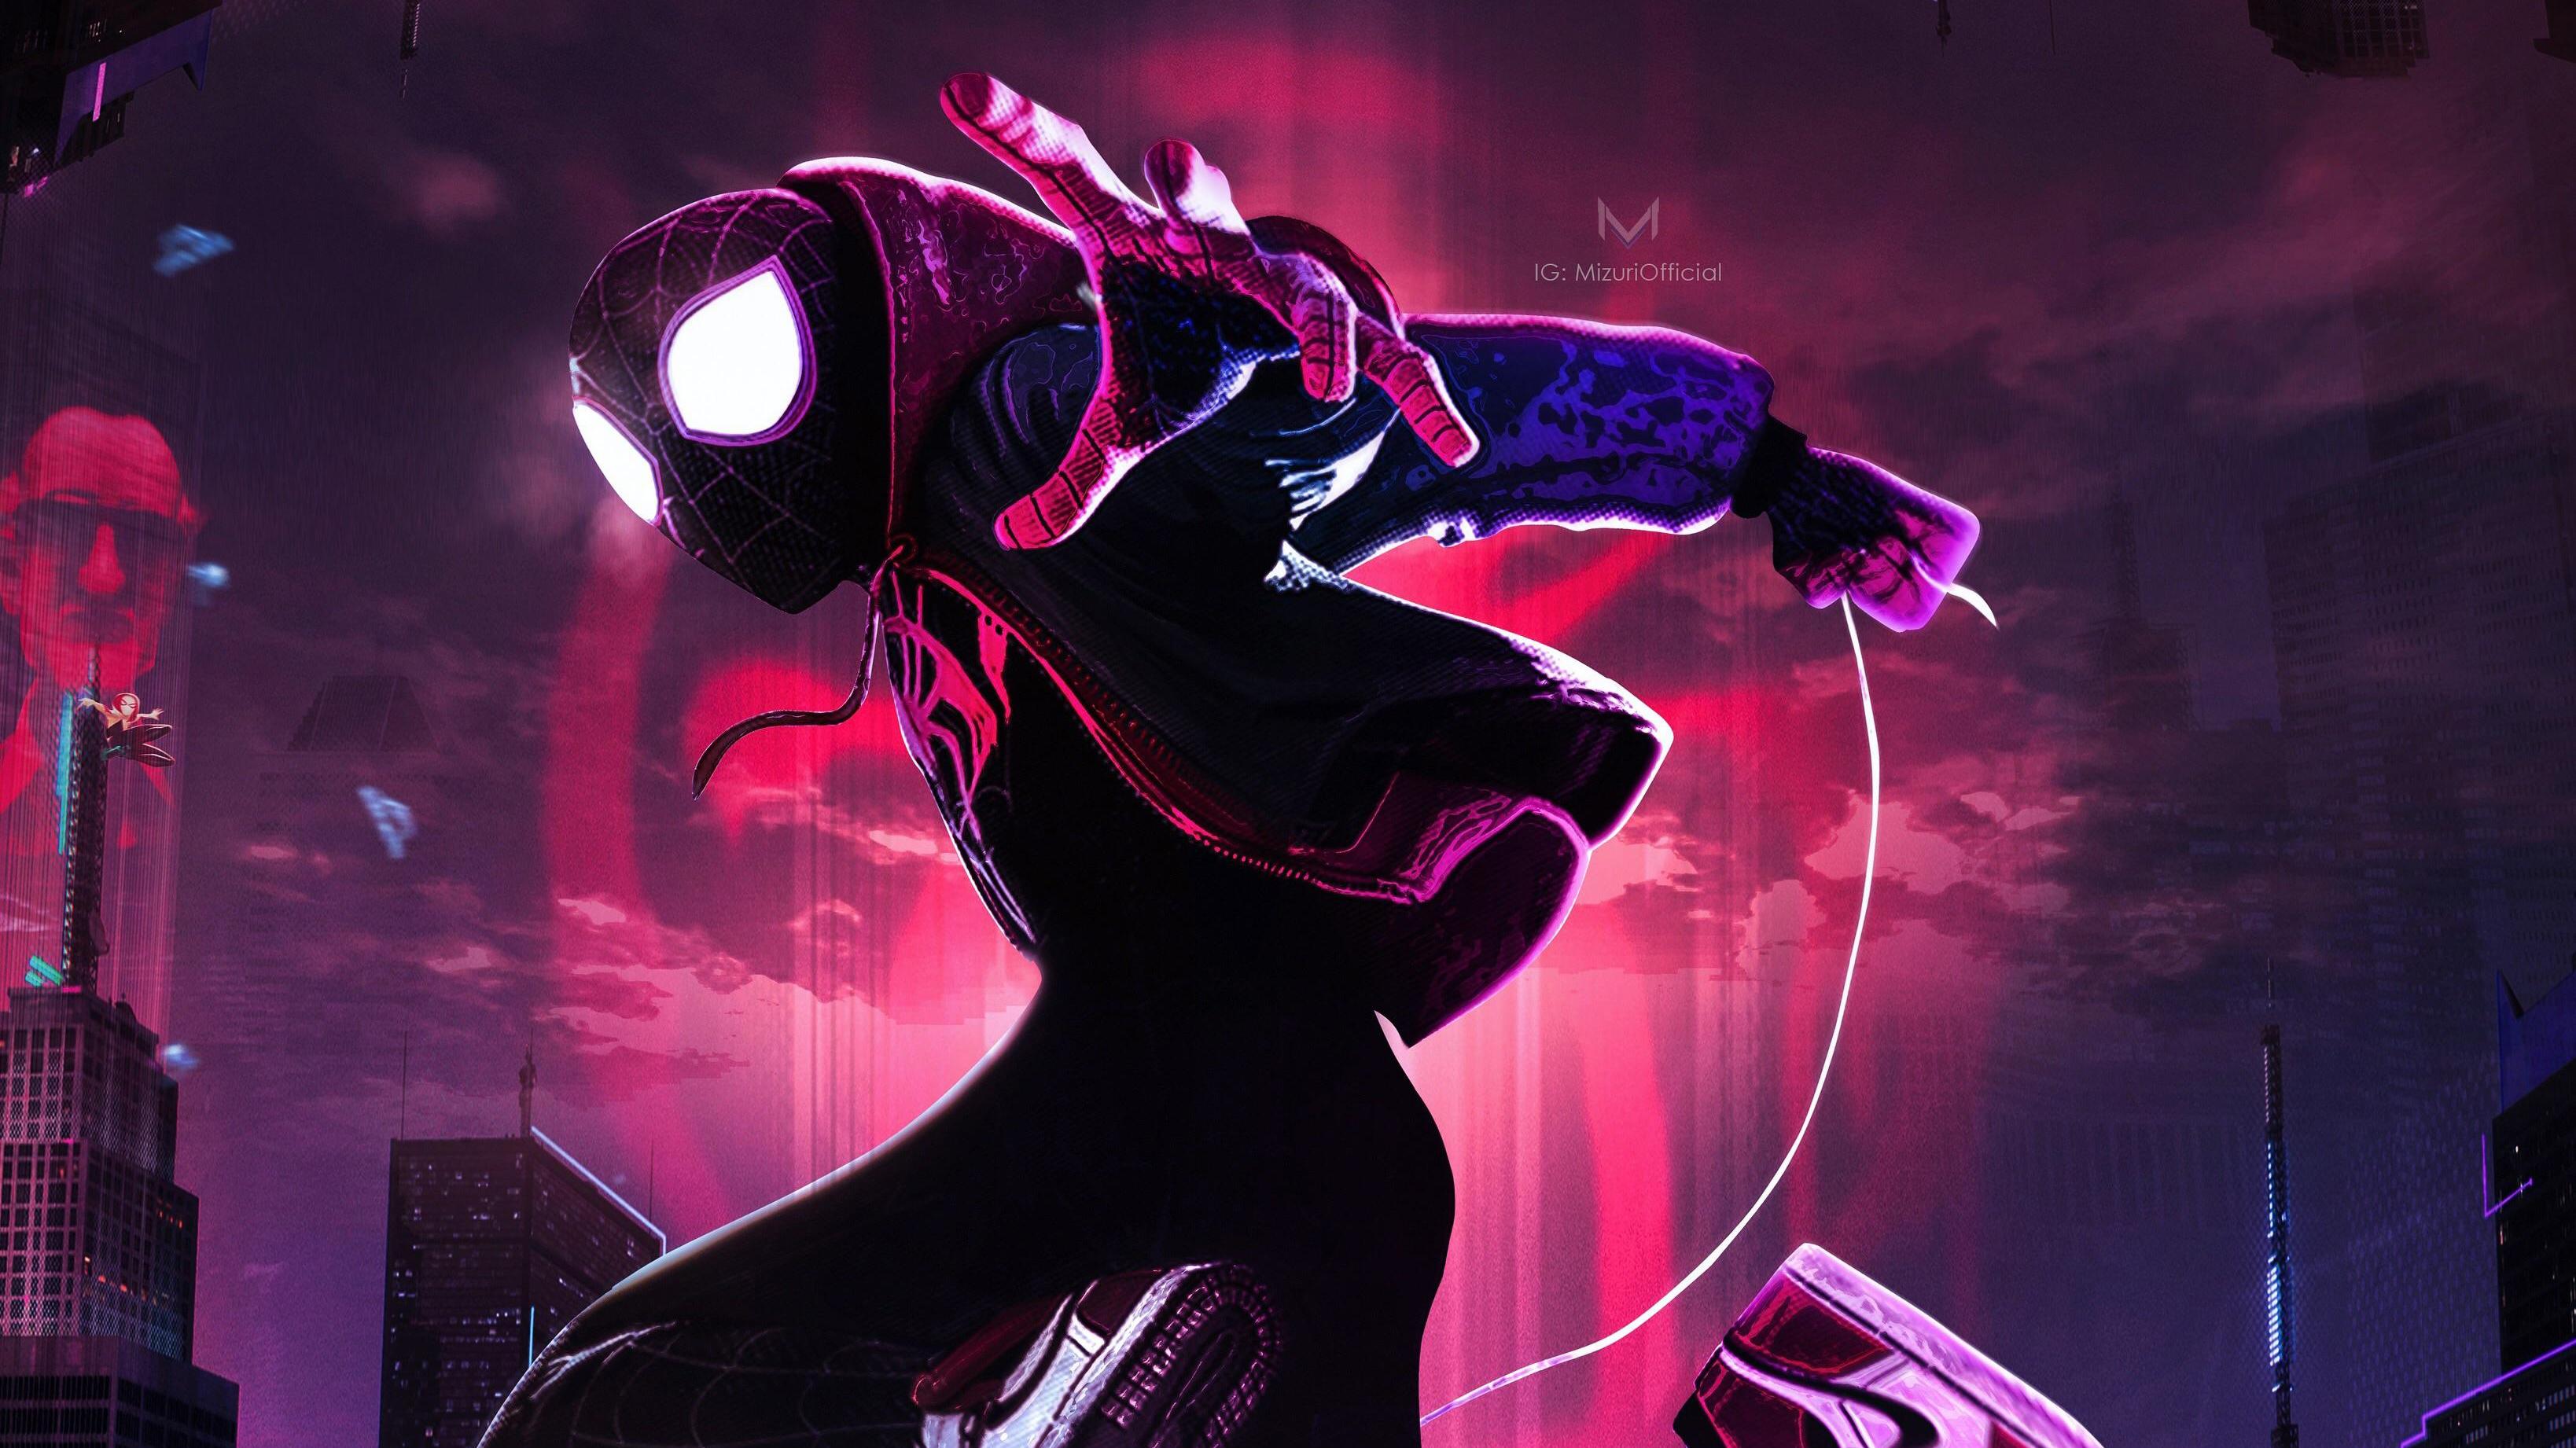 Spiderman into the spider verse movie new arts hd movies - New spiderman movie wallpaper ...